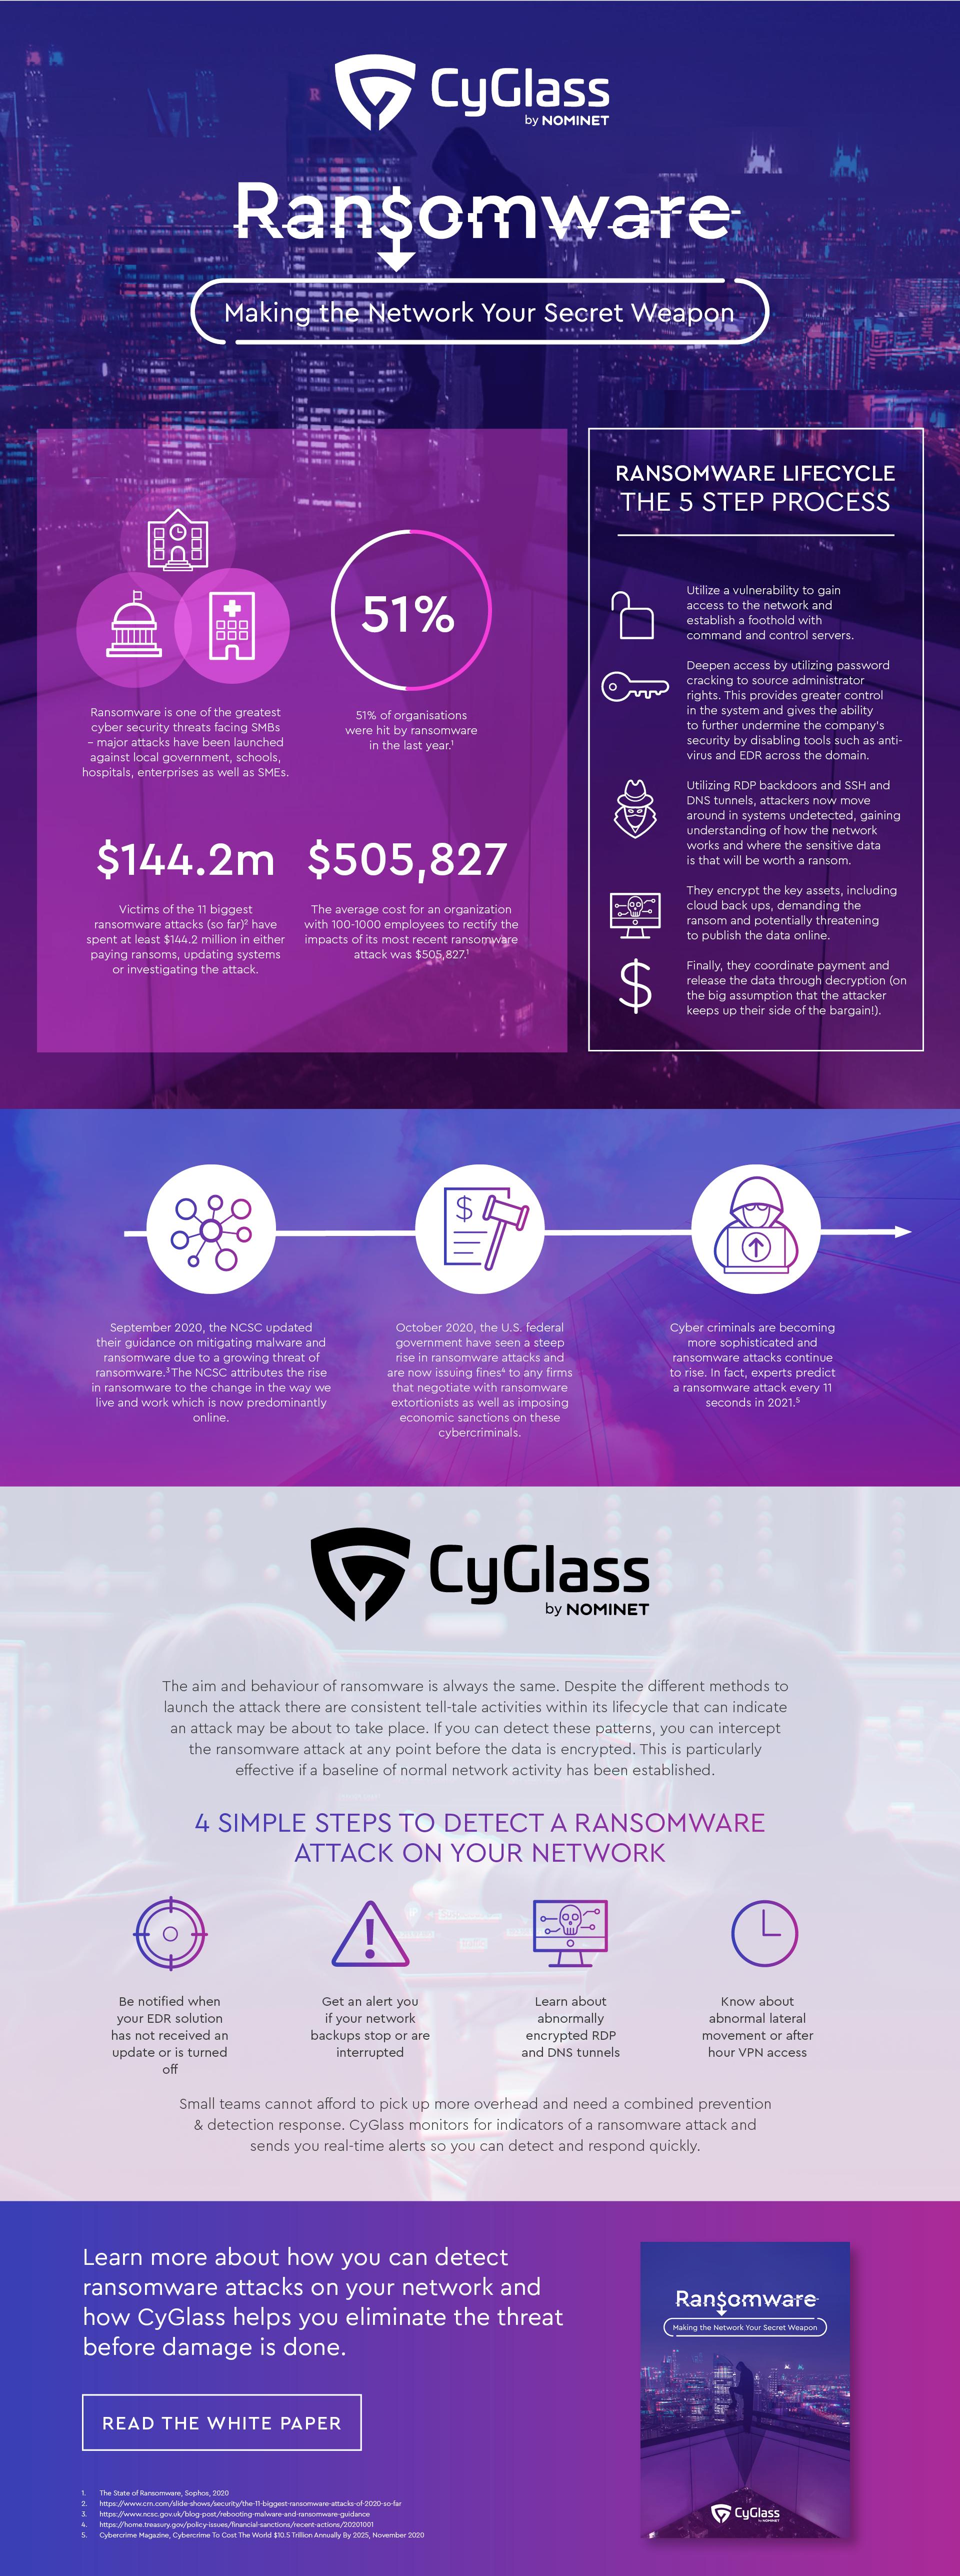 CYG01001_Ransomware_Infographic_V2